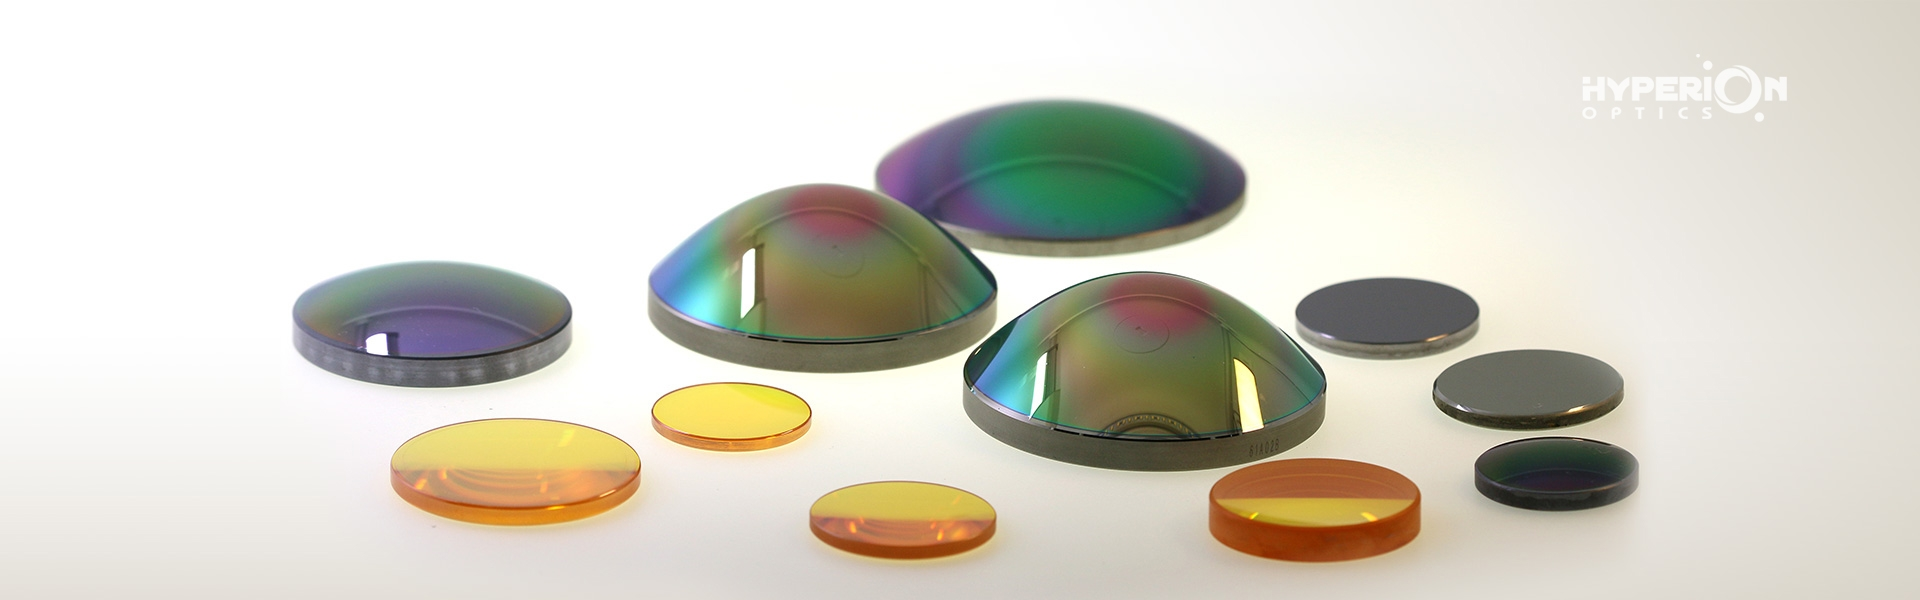 Hyperion infrared lenses manufacturer